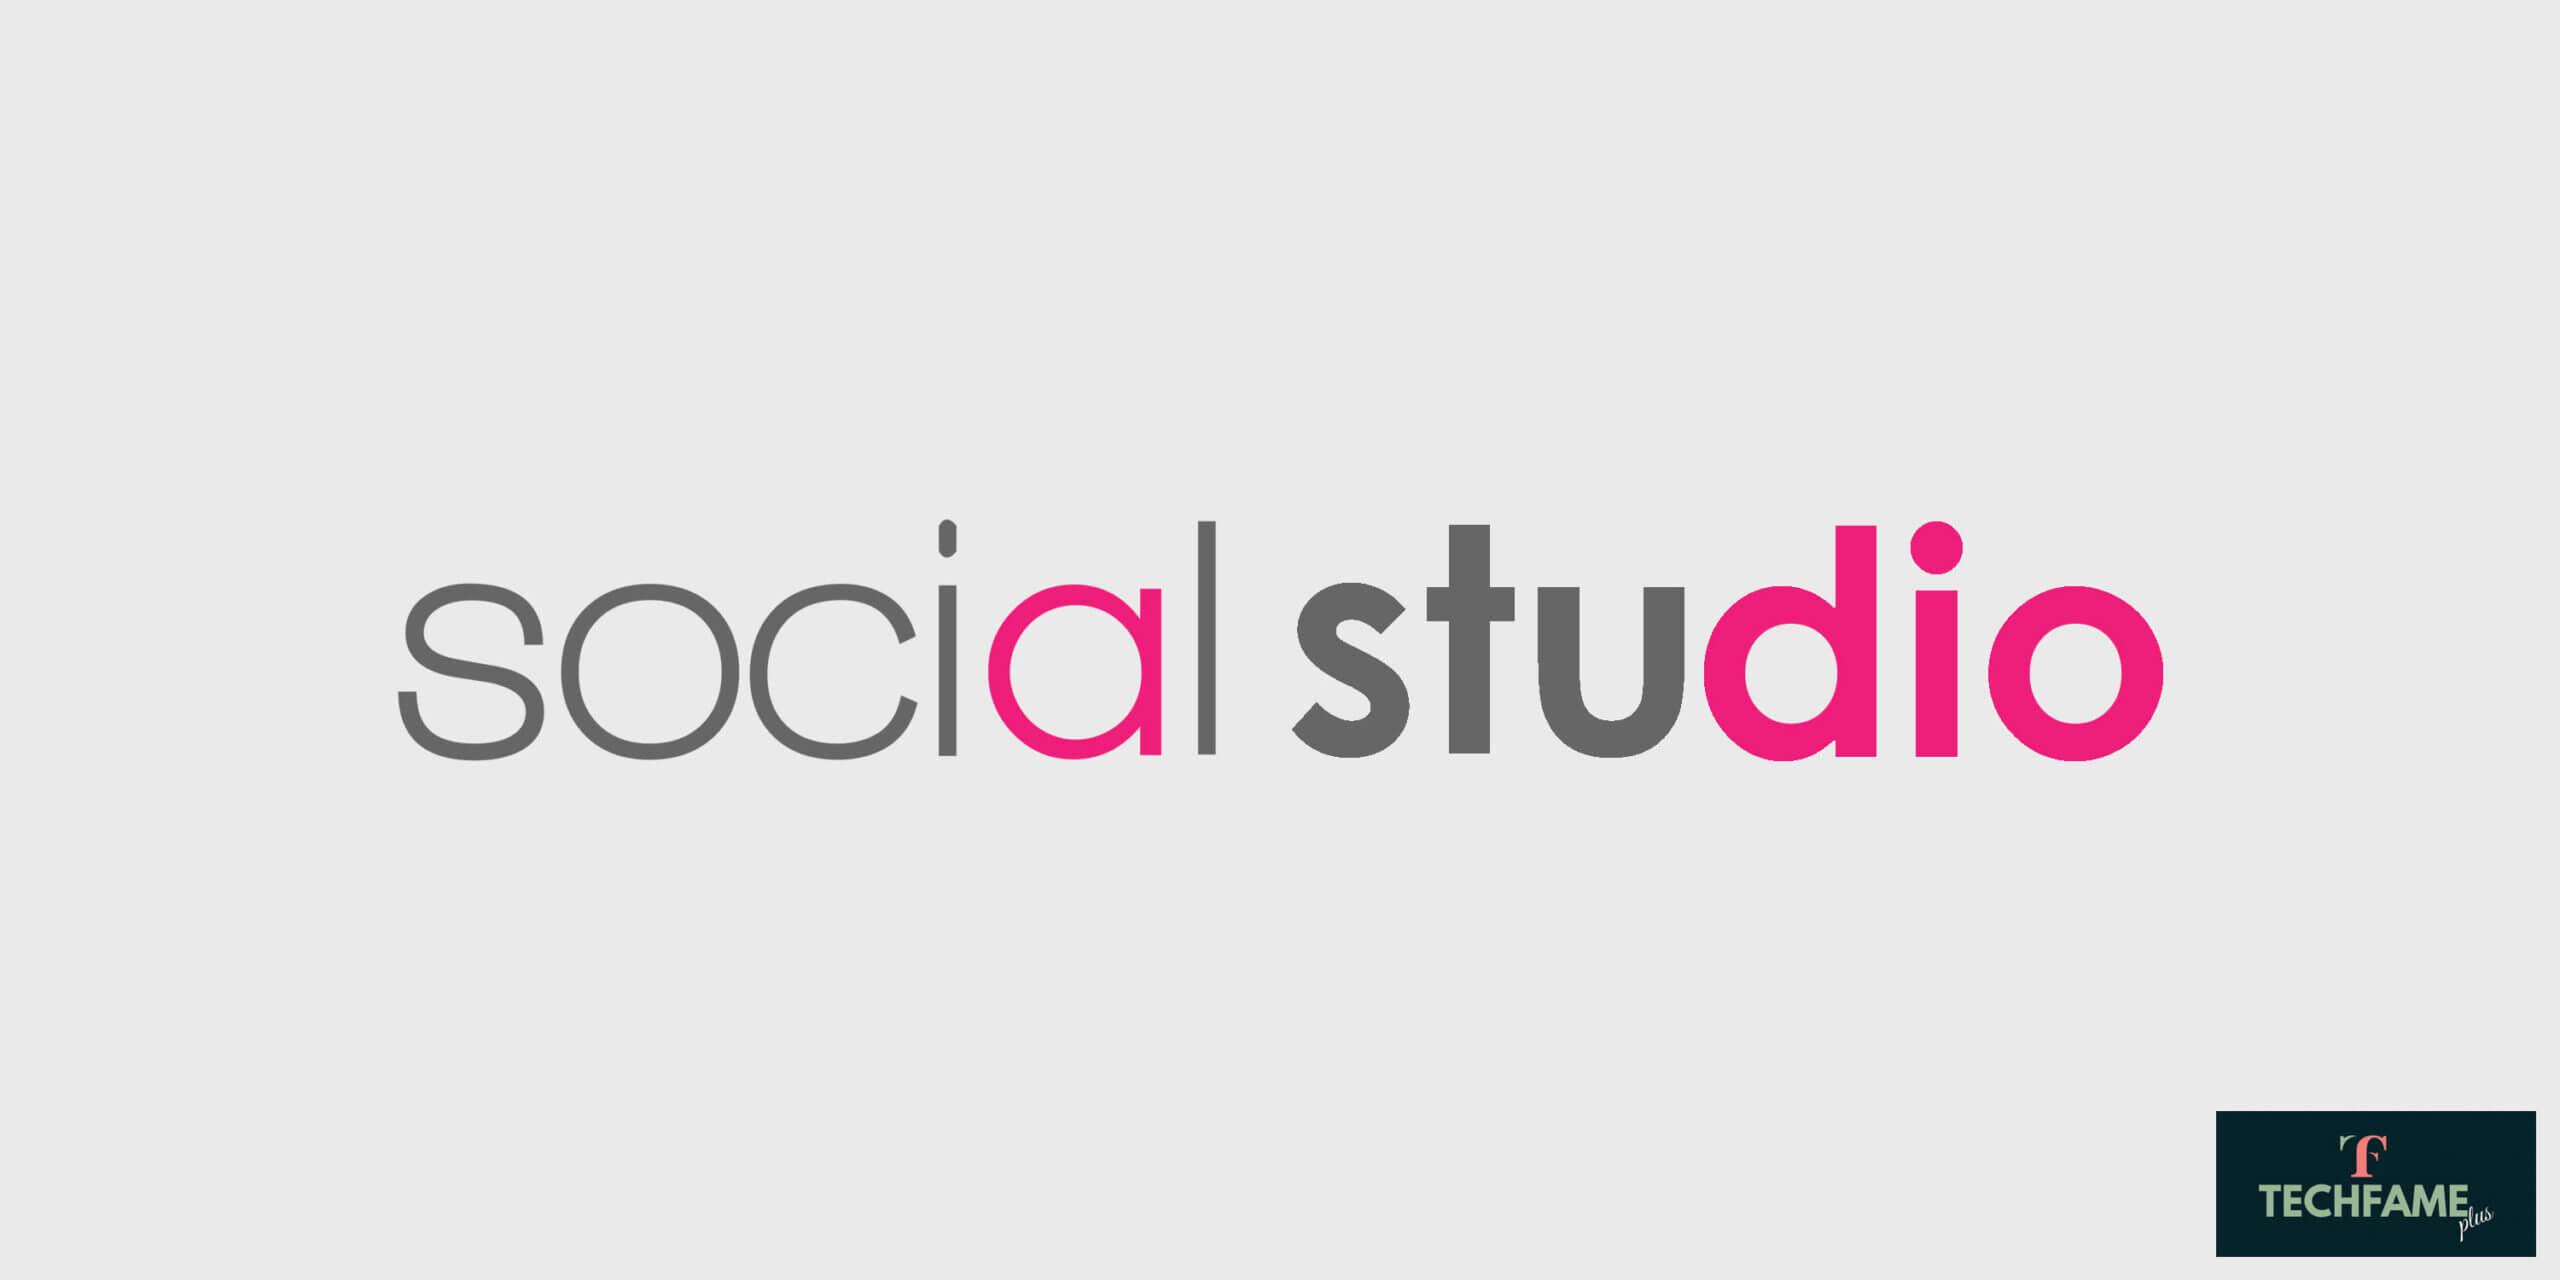 020 Free Psd Logo Templates Social Studio Business Design For Business Logo Templates Free Download